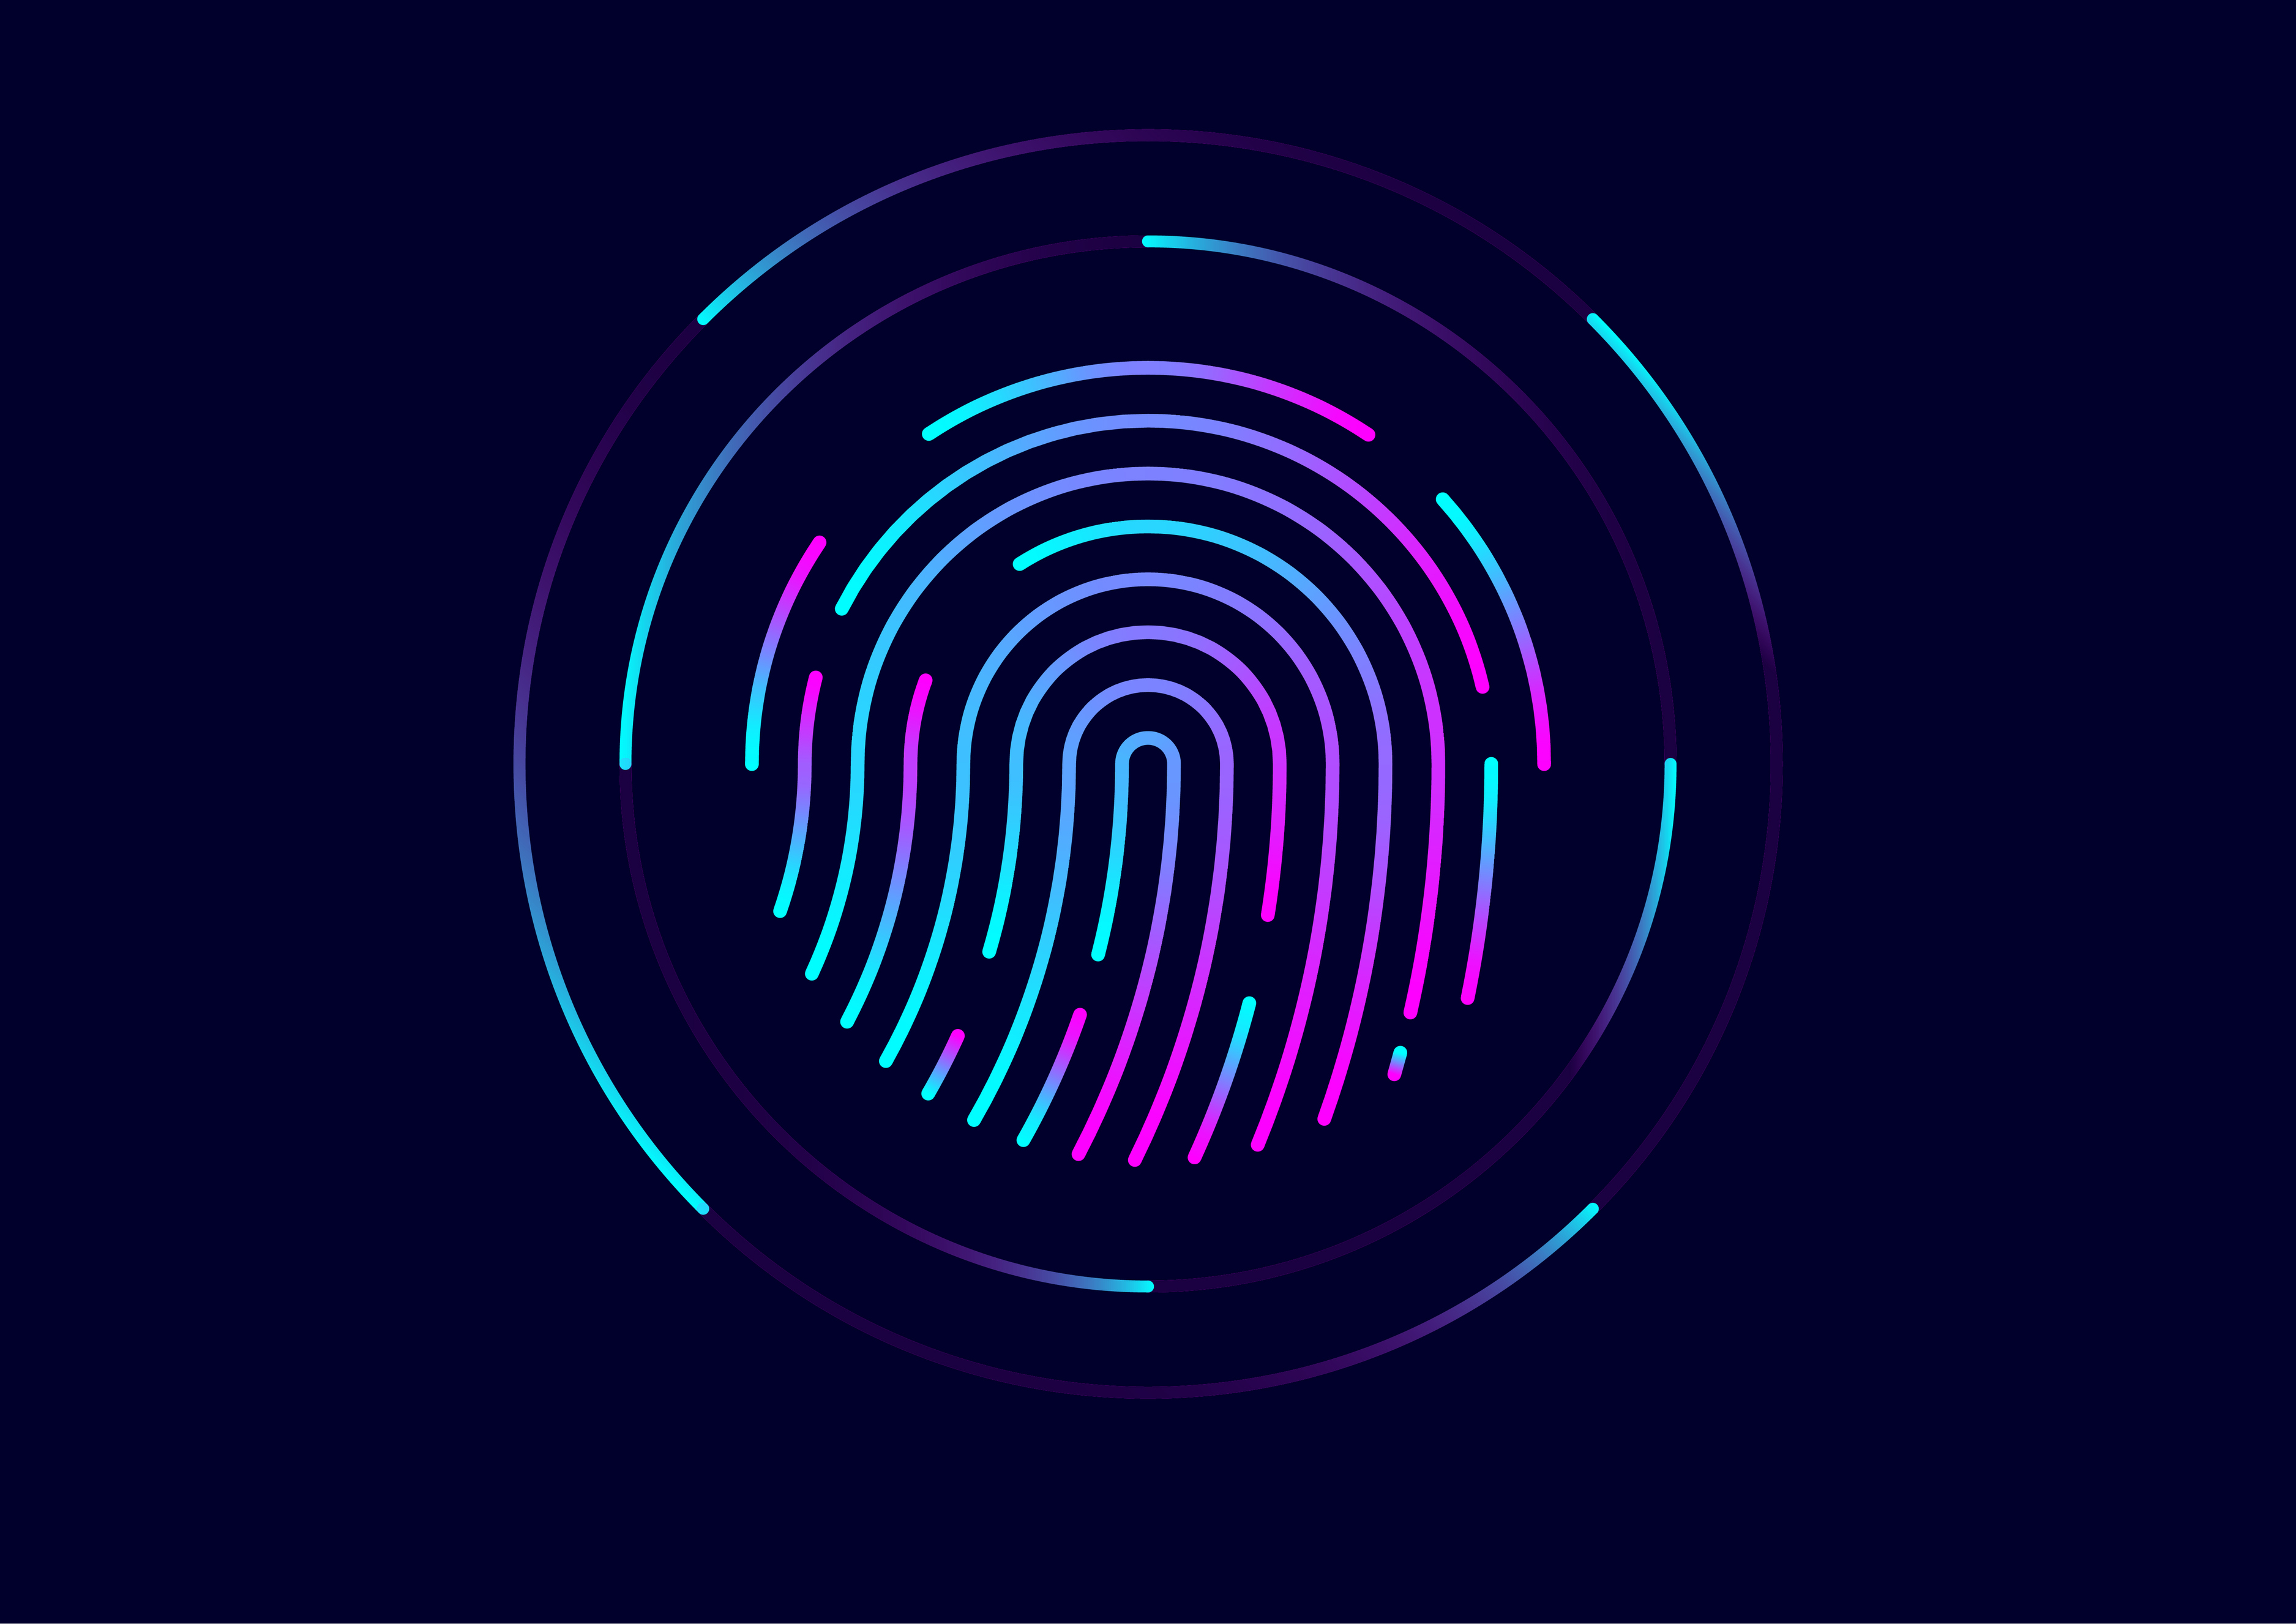 7 Best Practices to Protect Your Twilio SendGrid Account and Sending - Twilio